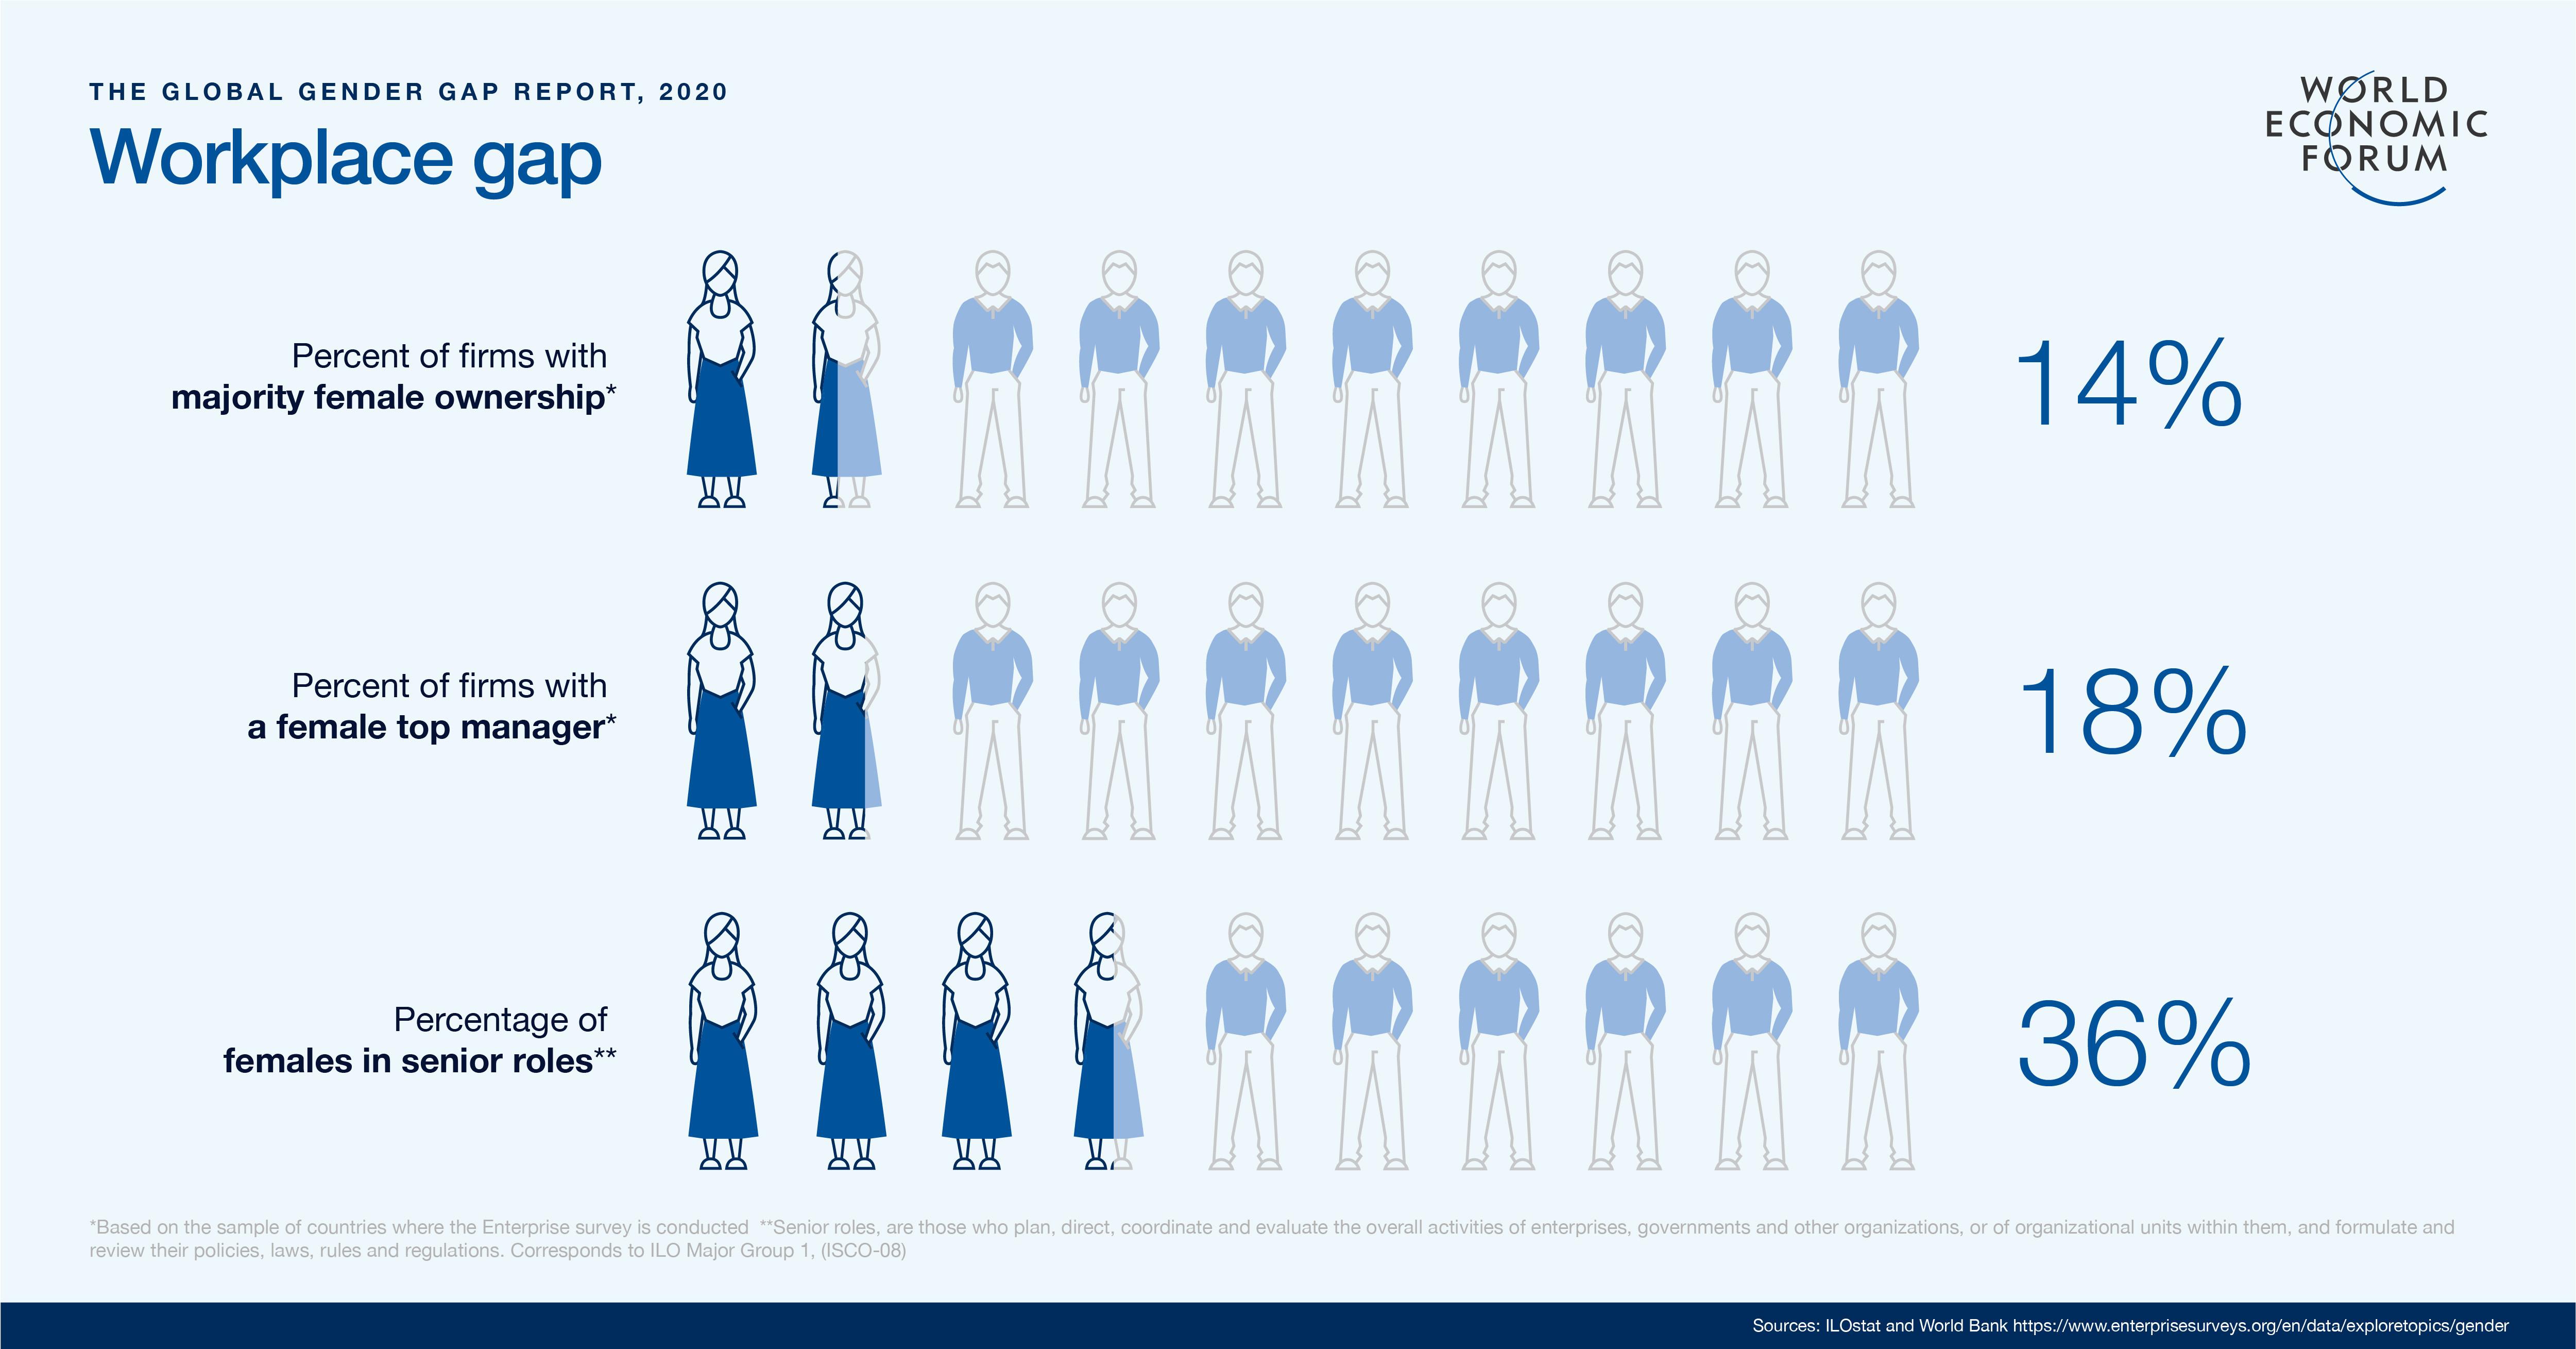 workplace gap - Global Gender Gap Report 2020